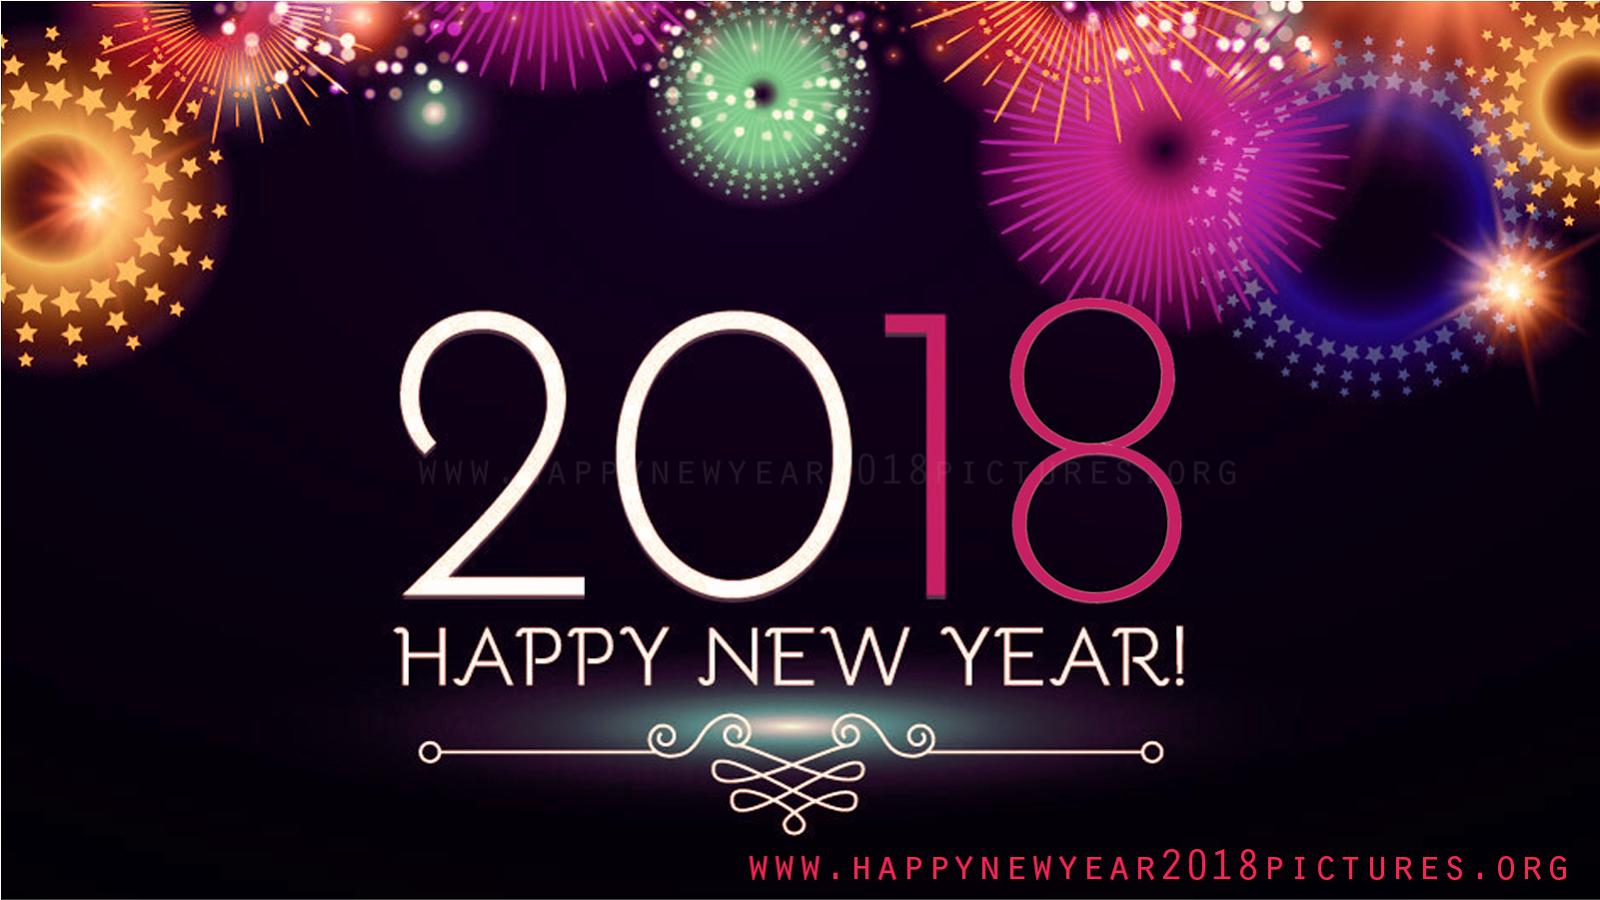 Happy New Year 2018 Photos 1600x900